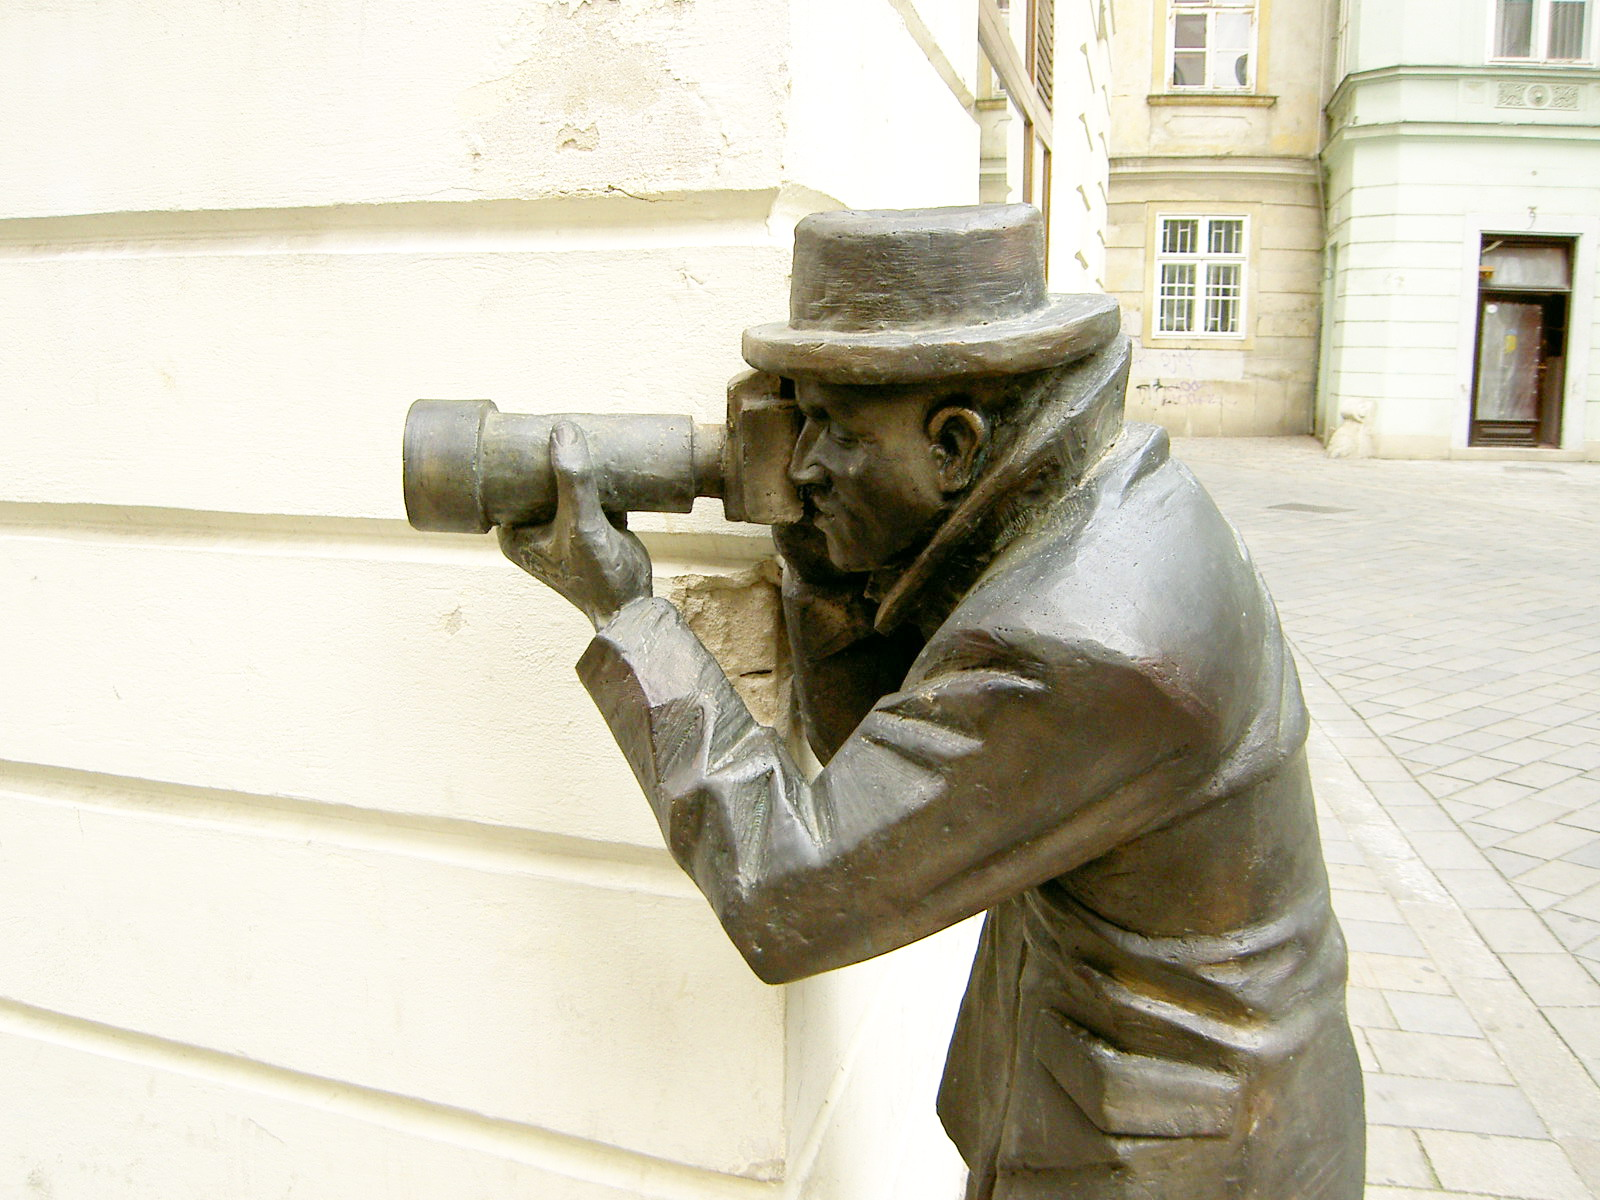 bratislava_bronze_paparazzo.jpg